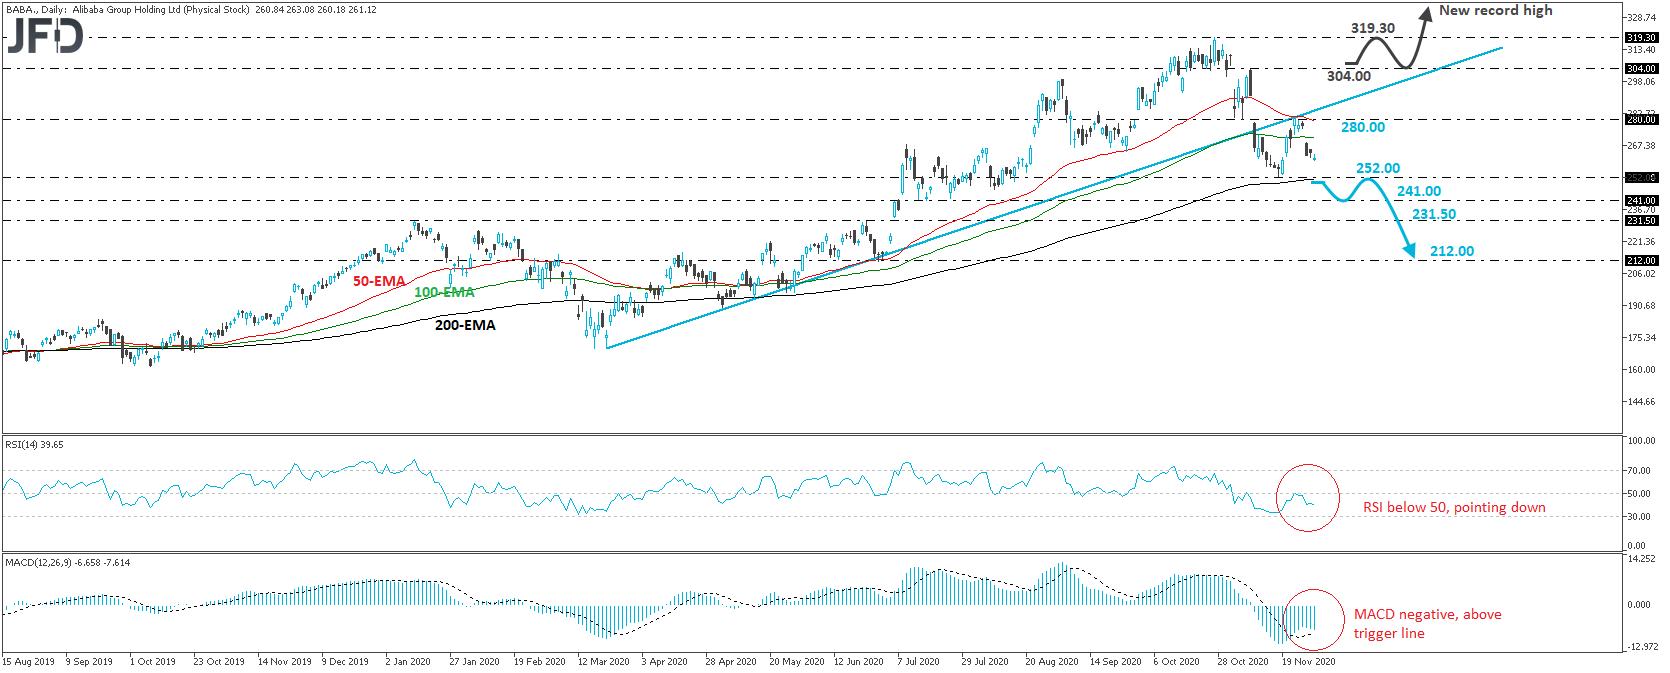 Alibaba stock daily chart technical analysis